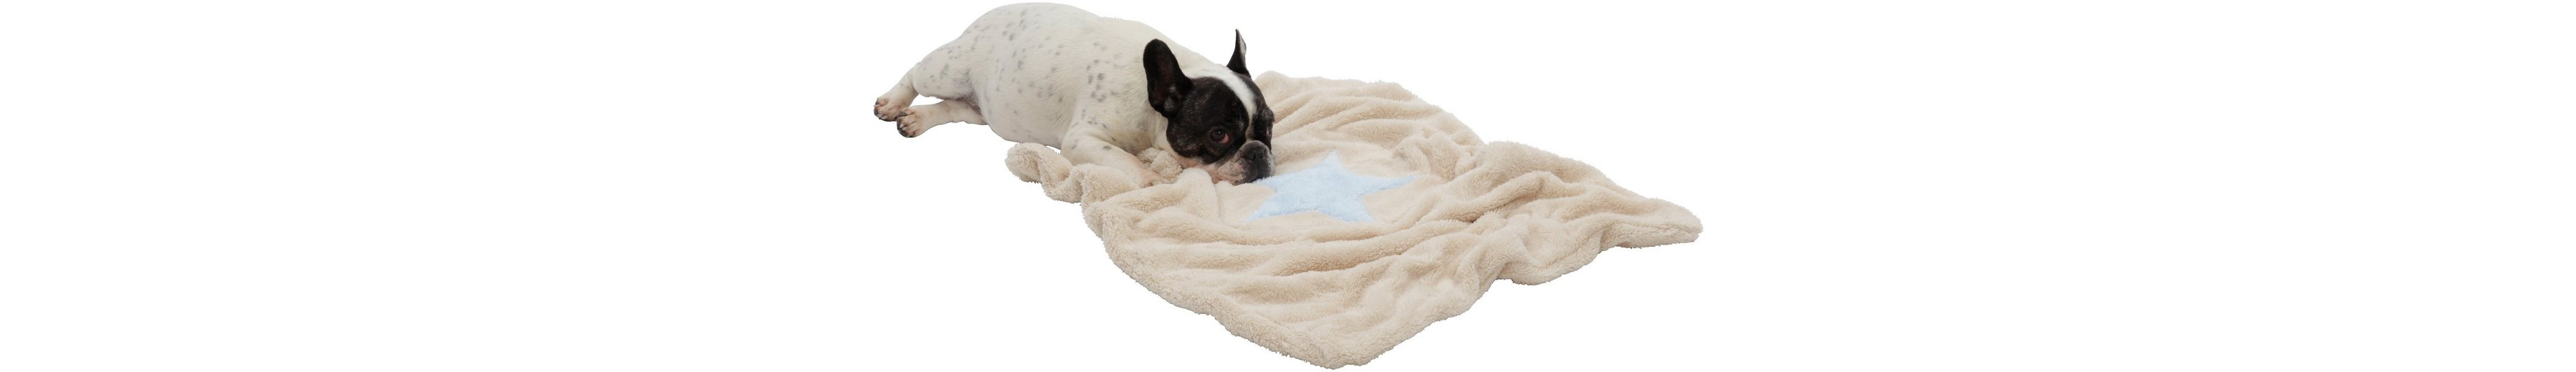 Hundedecke und Katzendecke »Pooch«, LxB: 85x110 cm, Creme-hellblau